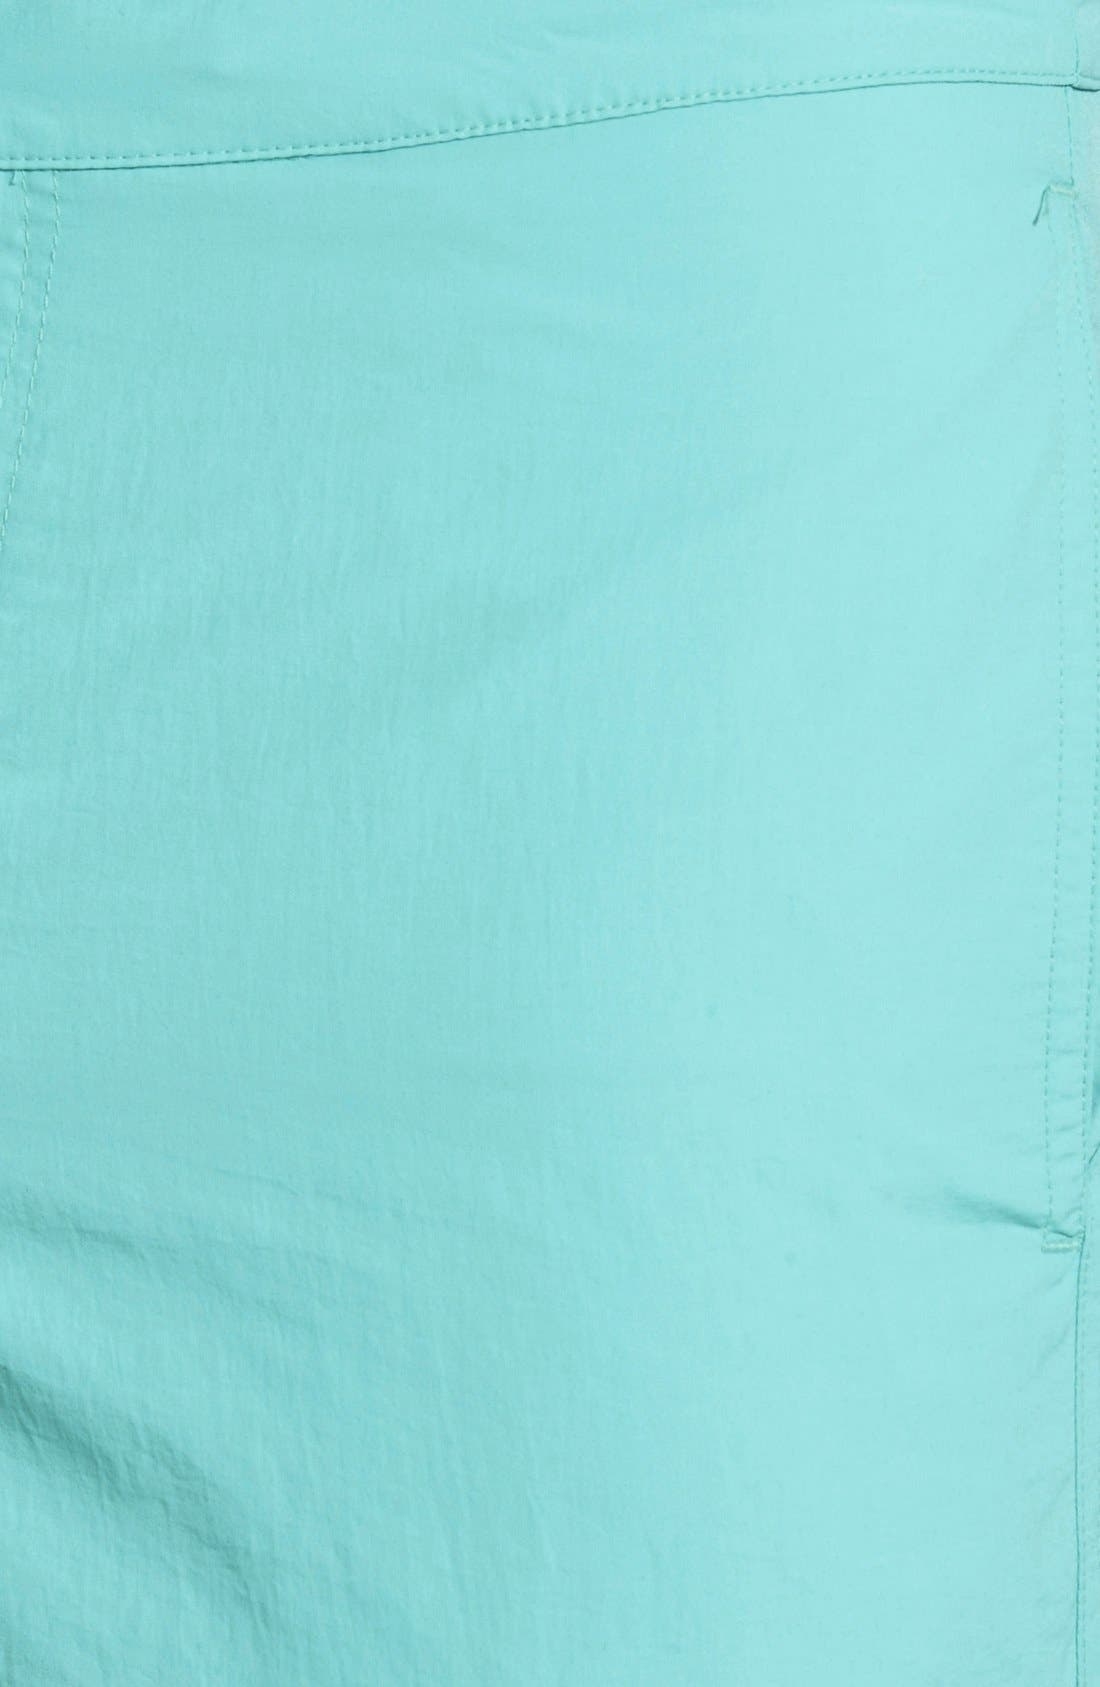 'Aruba - Island' Tailored Fit 8.5 Inch Board Shorts,                             Alternate thumbnail 8, color,